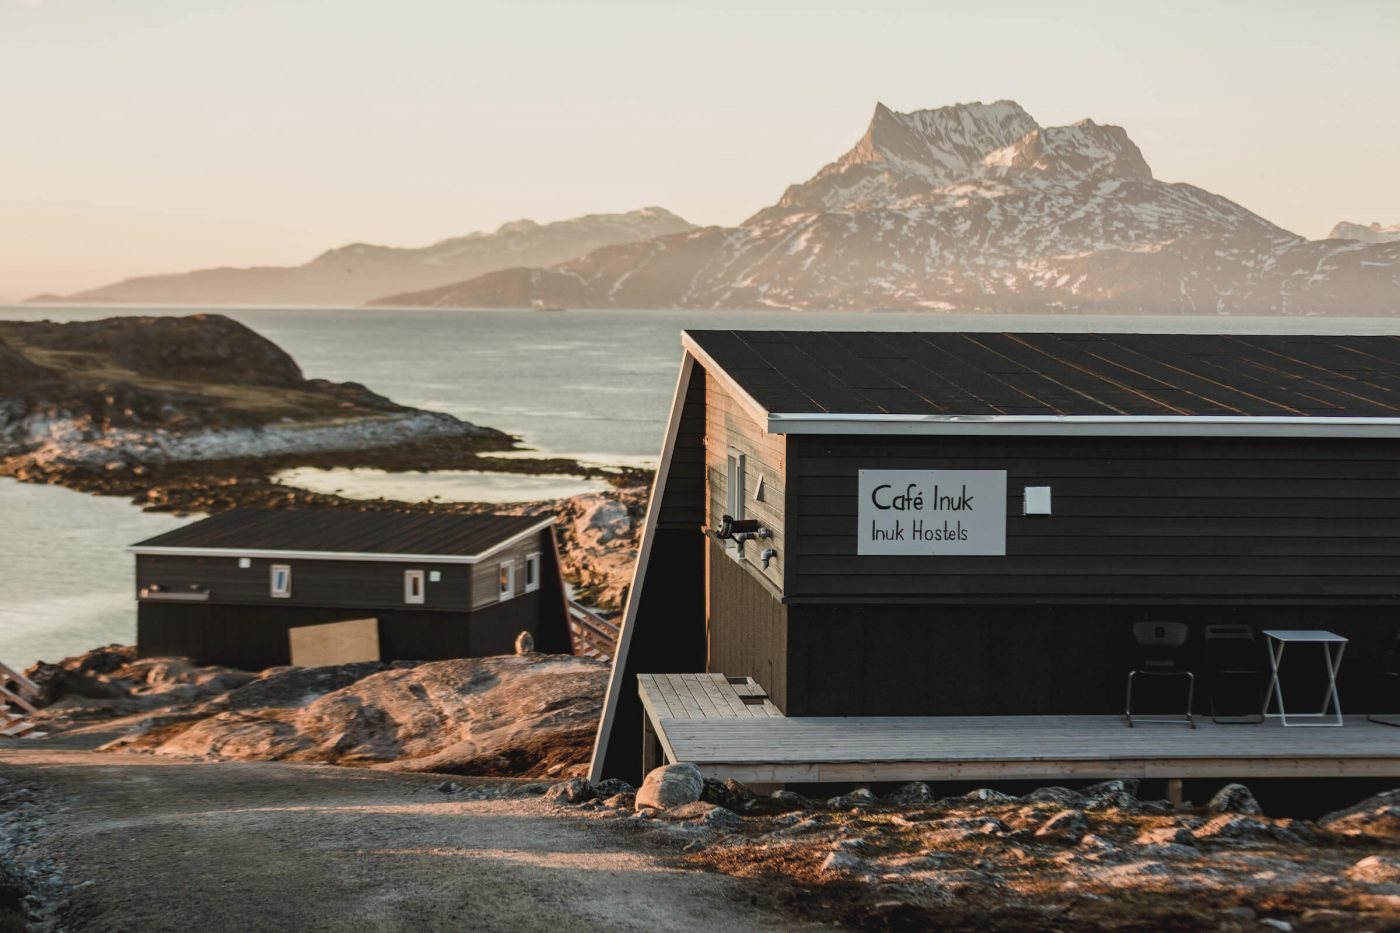 Inuk Hostels in Nuuk, with Sermitsiaq Mountain. Photo by Daniel Gurrola - Visit Greenland